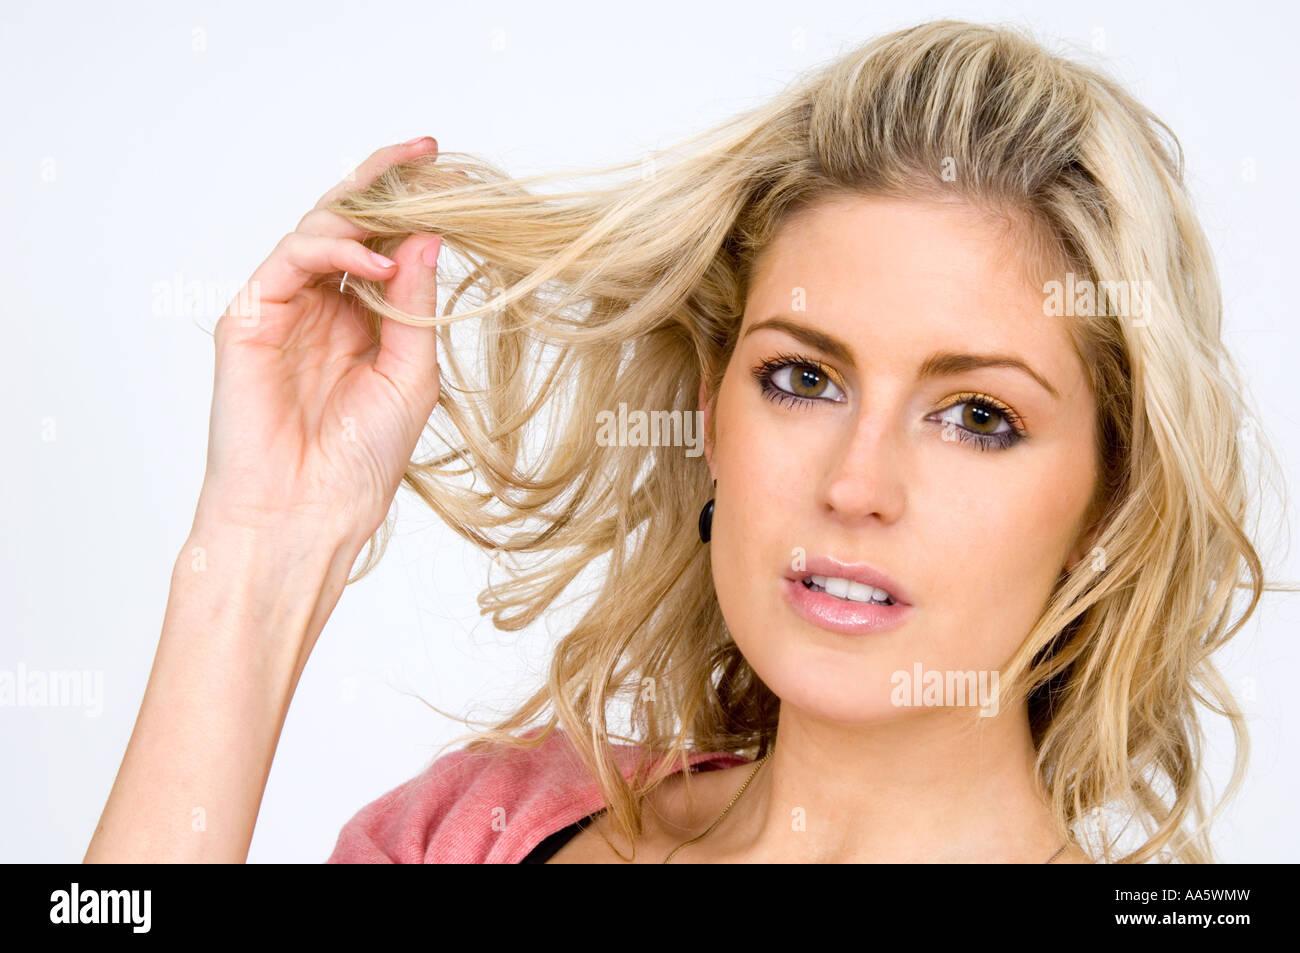 Female Body Language Hair